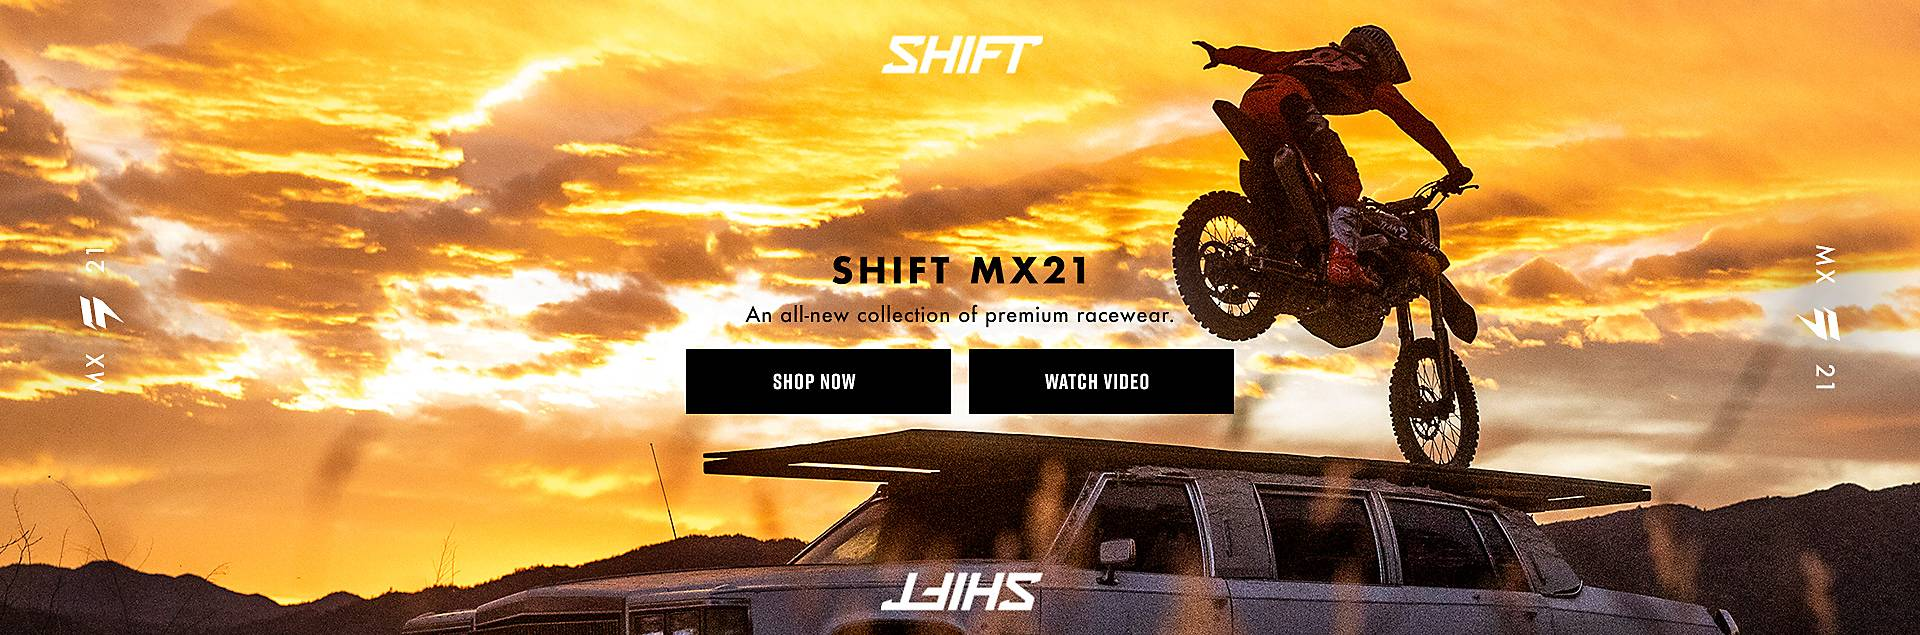 Shop MX21